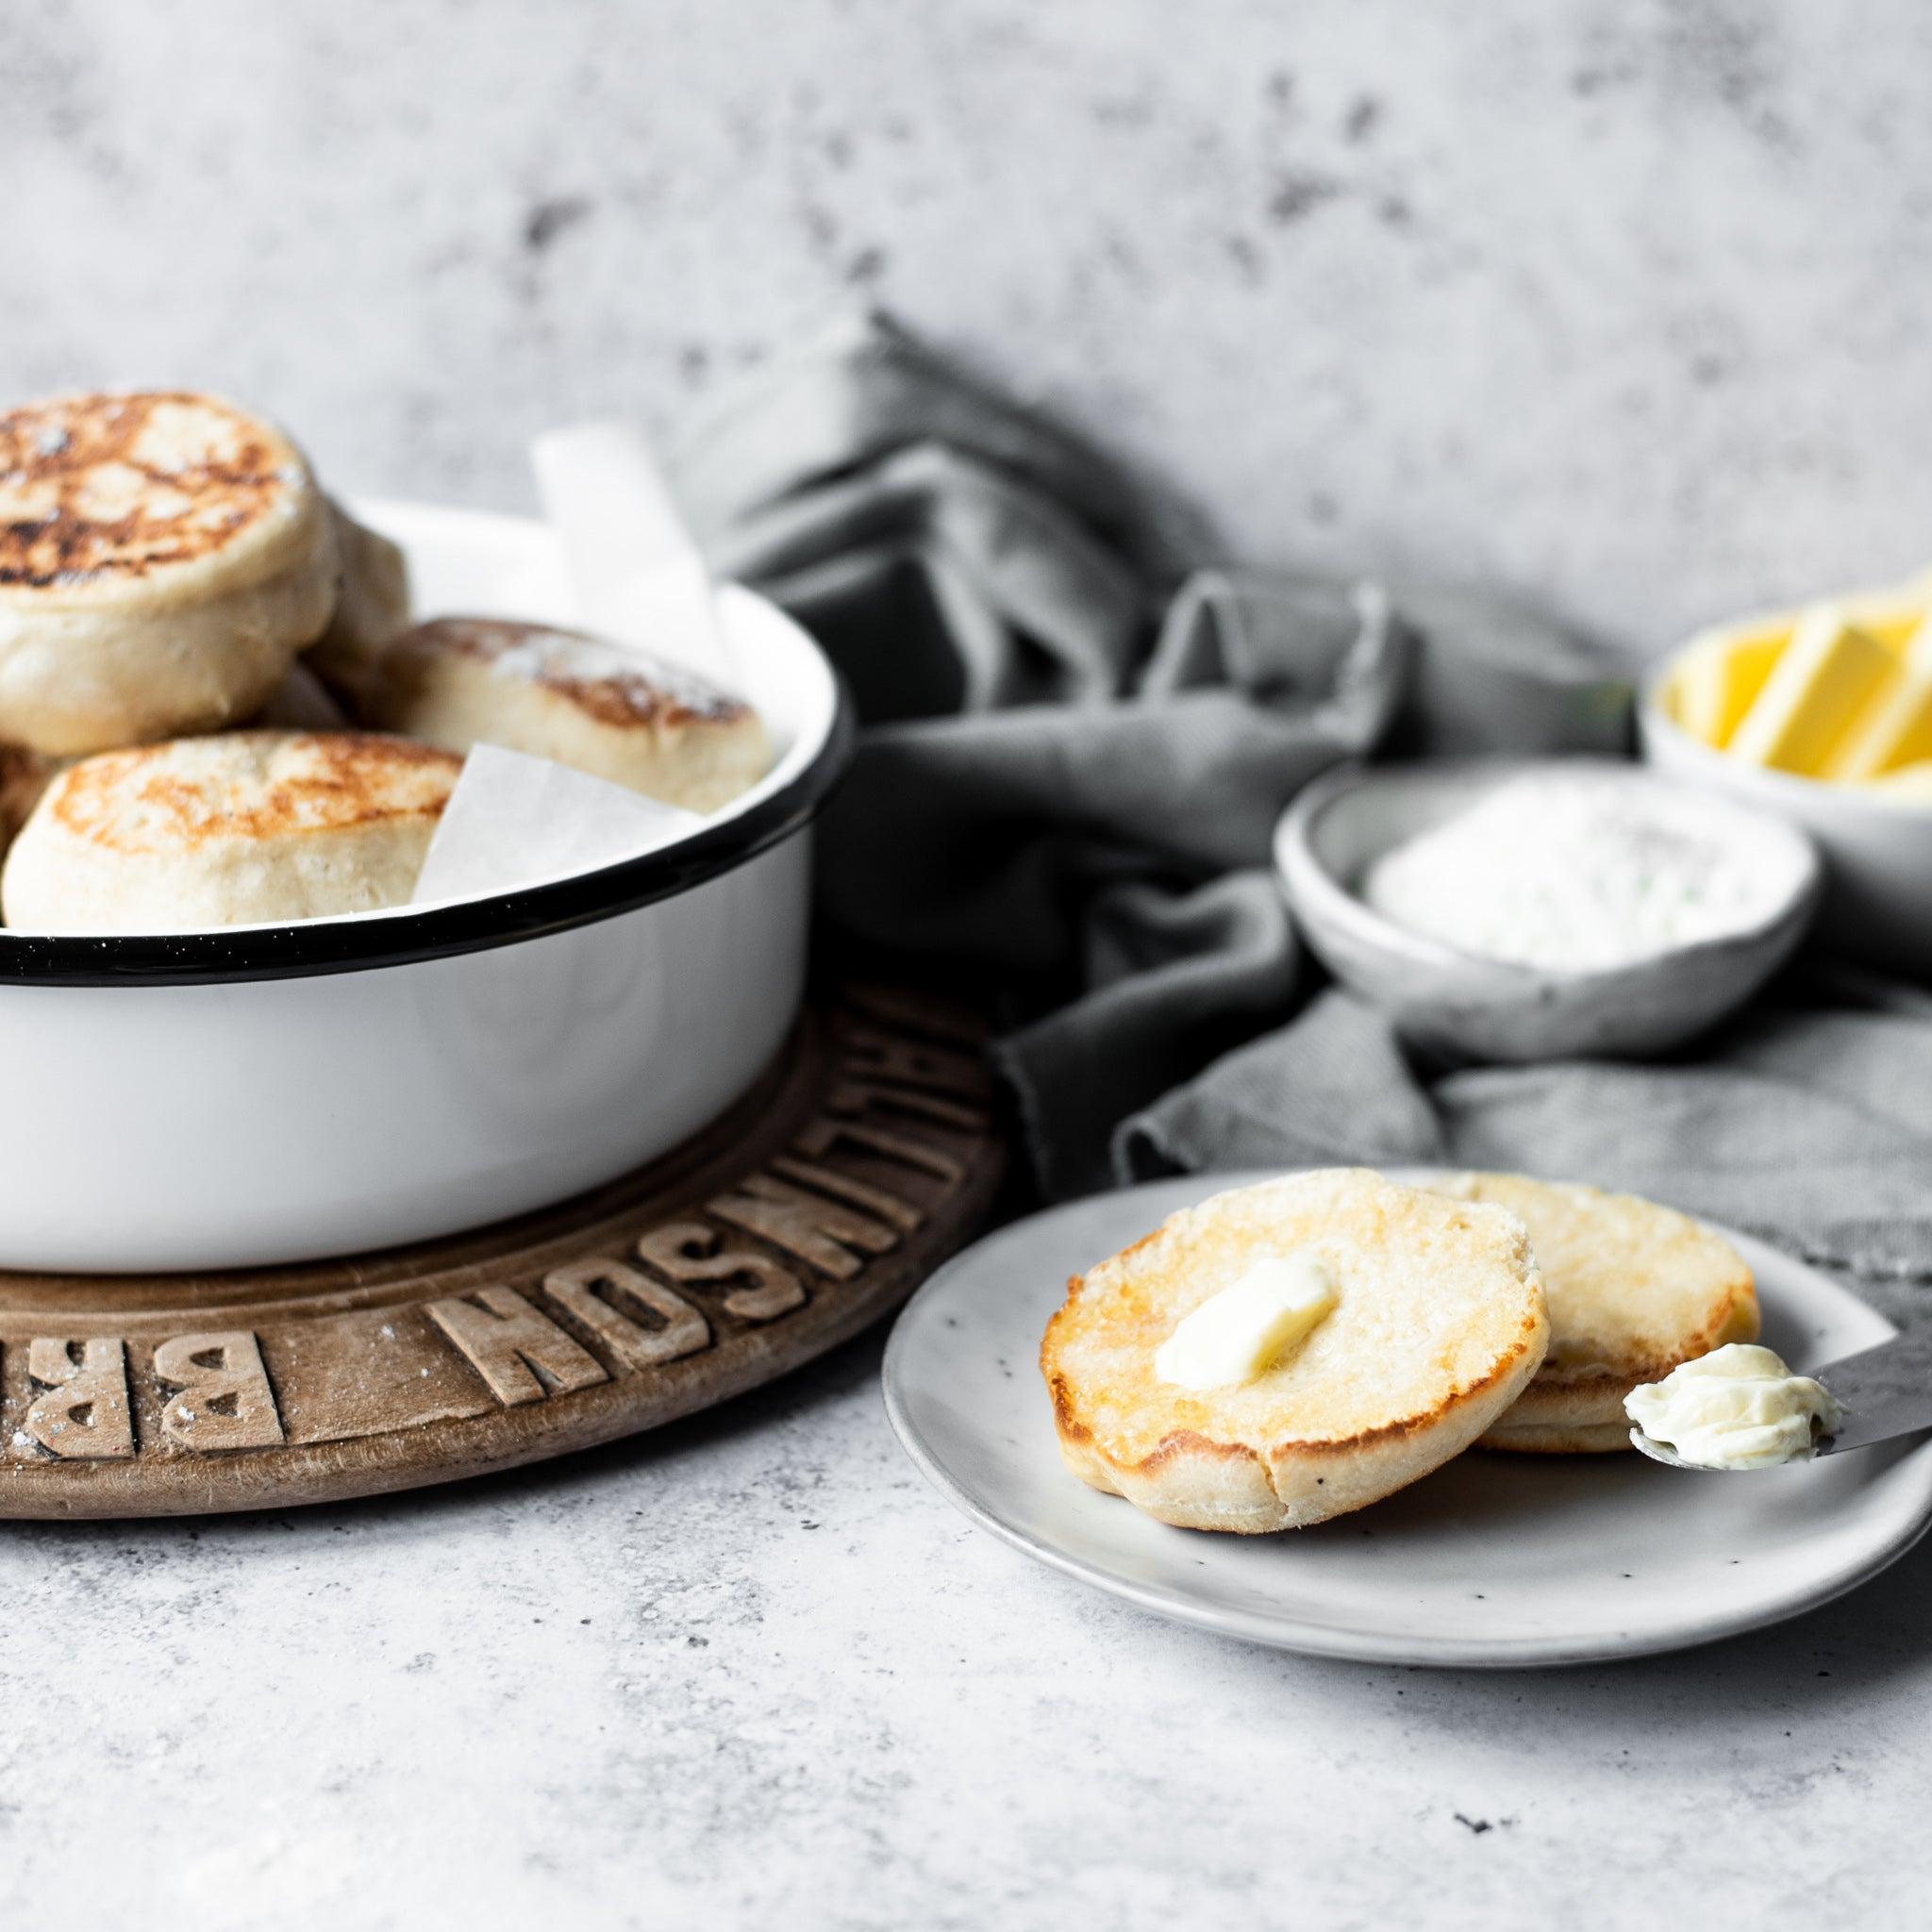 Allinsons-English-Muffins-1-1-Baking-Mad-6.jpg